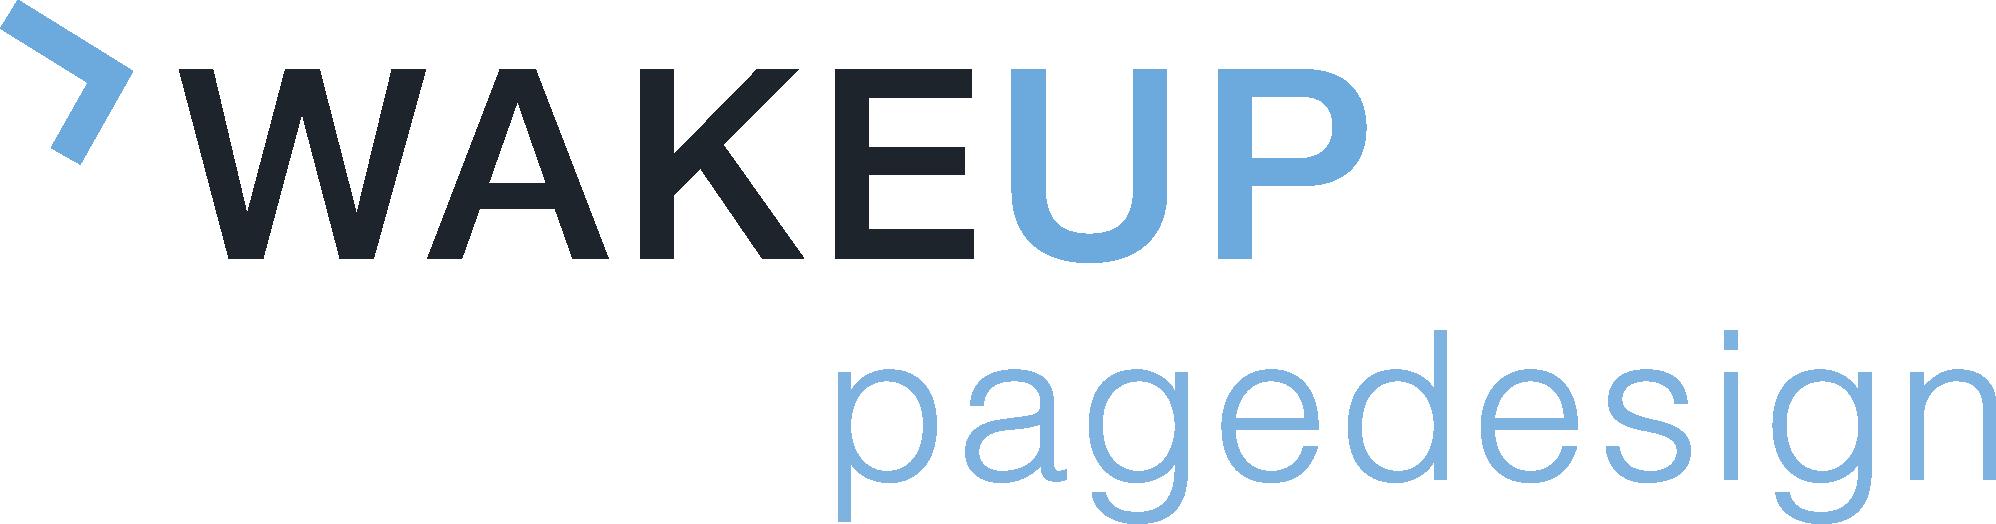 wake up page design